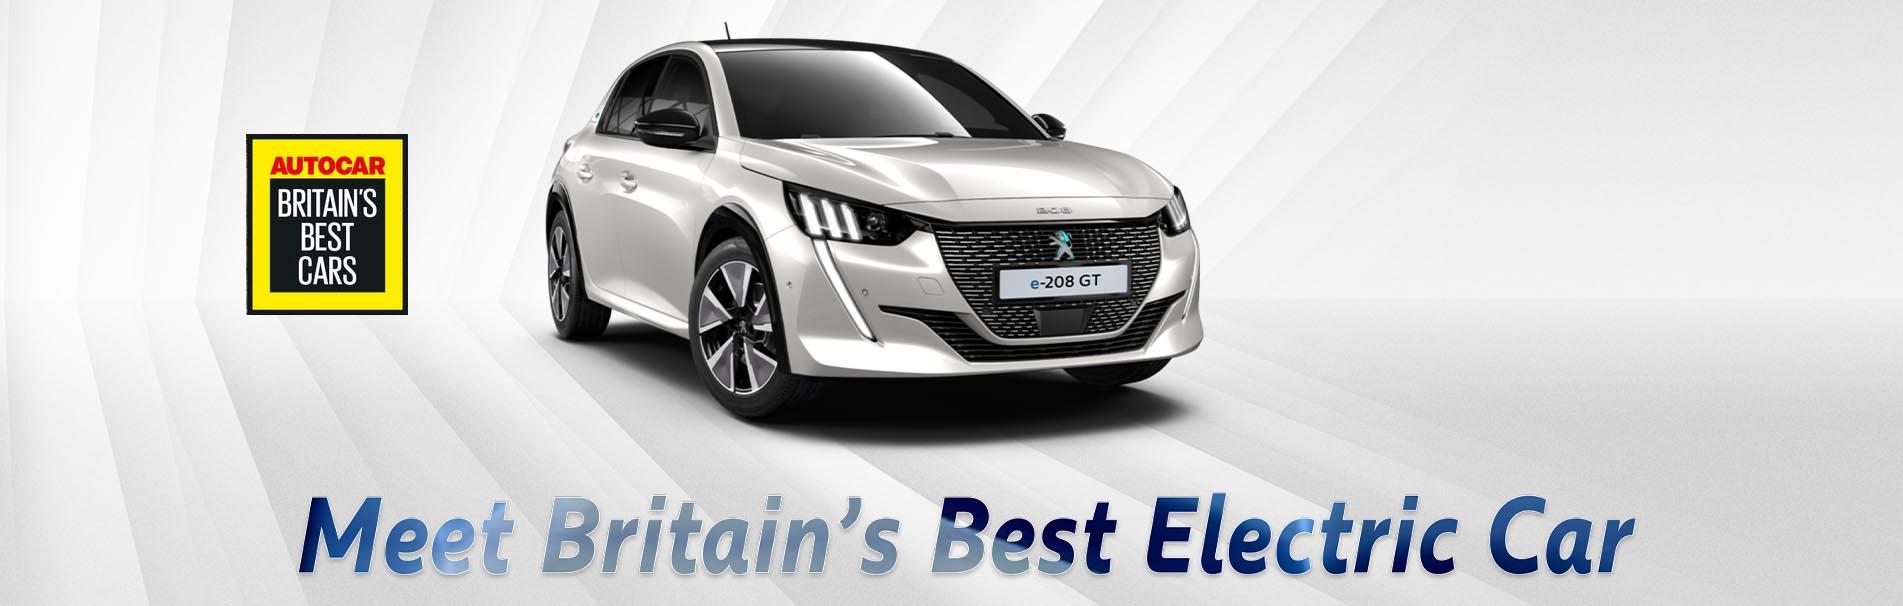 all-new-e-208-britains-best-electric-car-2020-sli